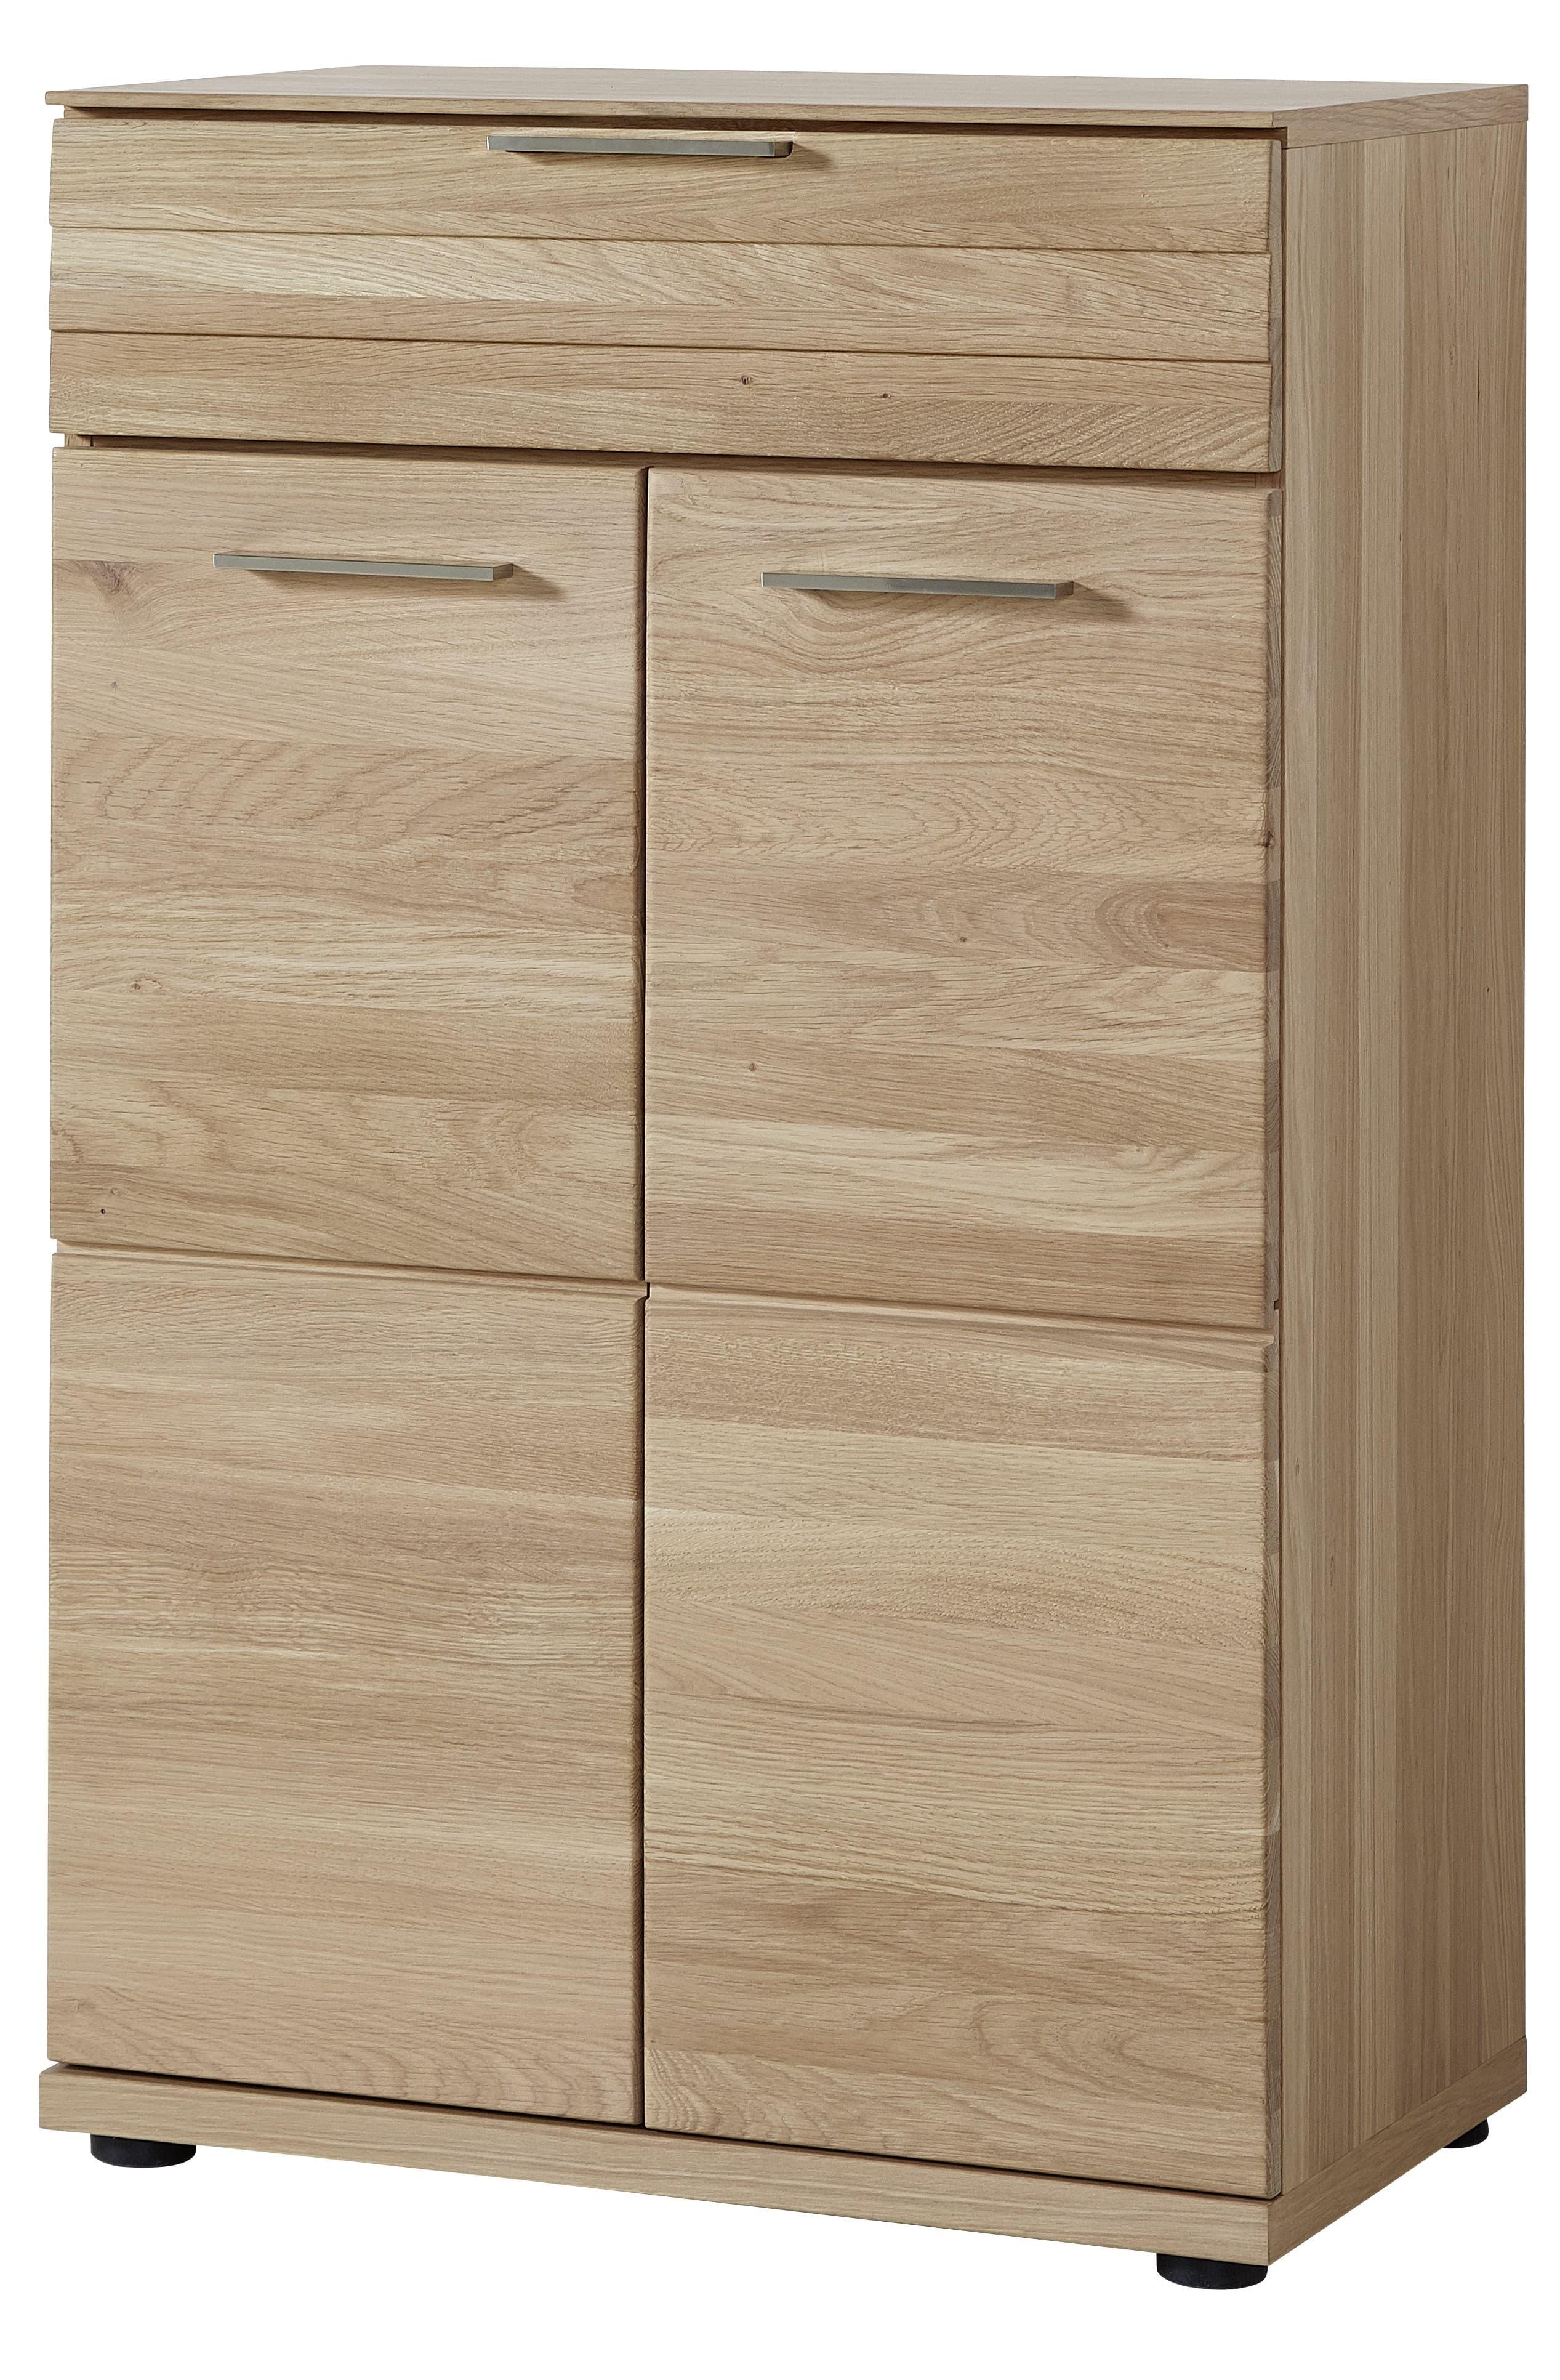 Cabinet hol din pal si MDF, cu 2 usi si 1 sertar, Archi Natur, l65xA40xH100 cm imagine